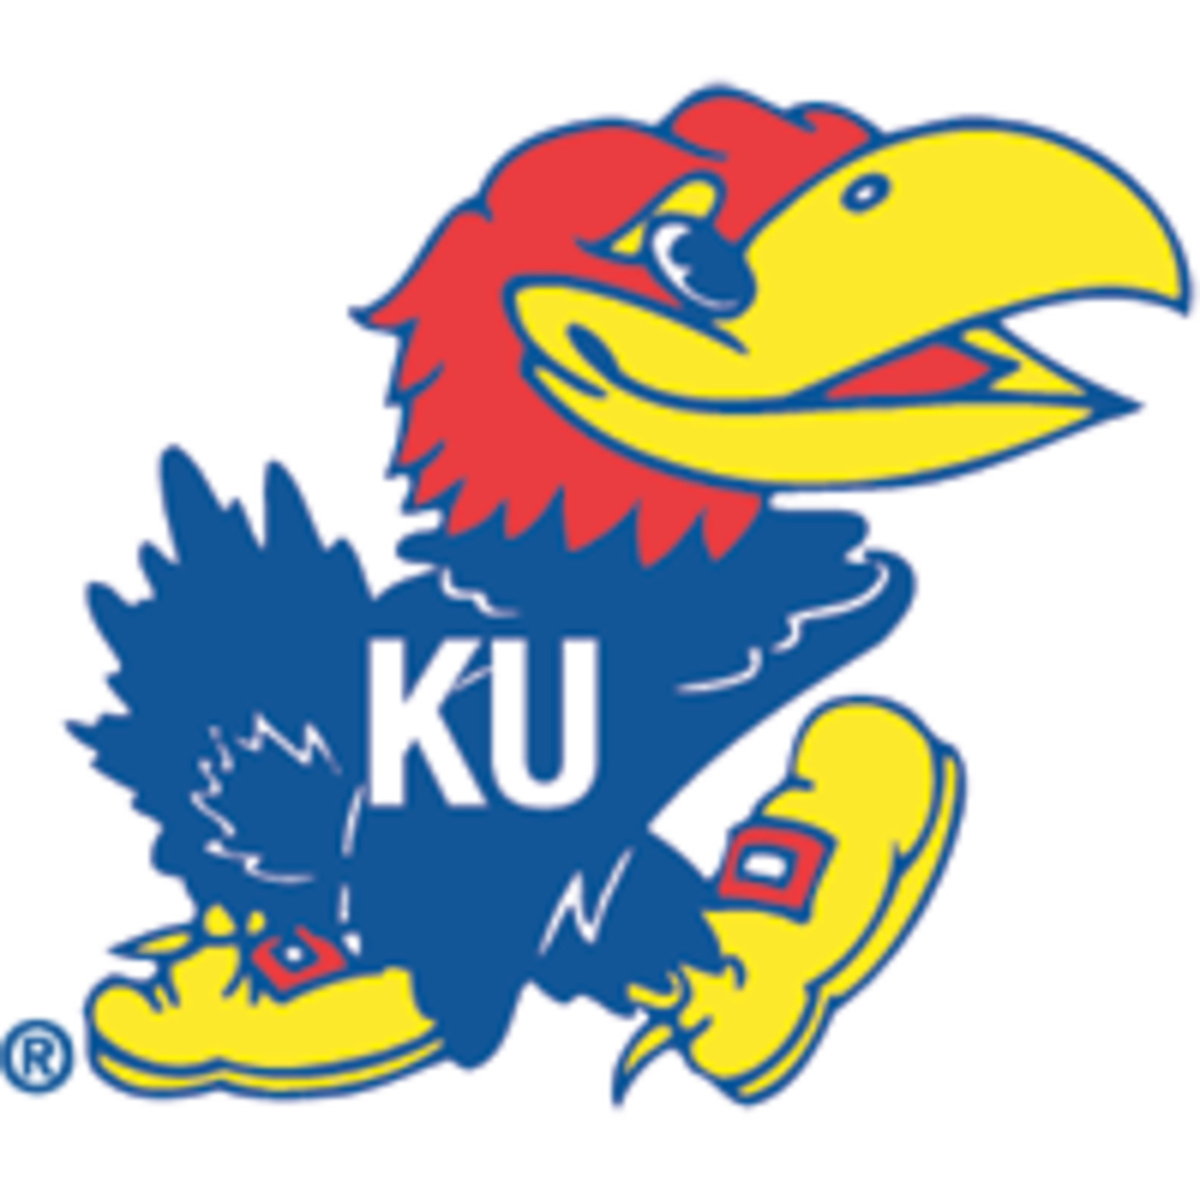 College Football Rankings: Kansas